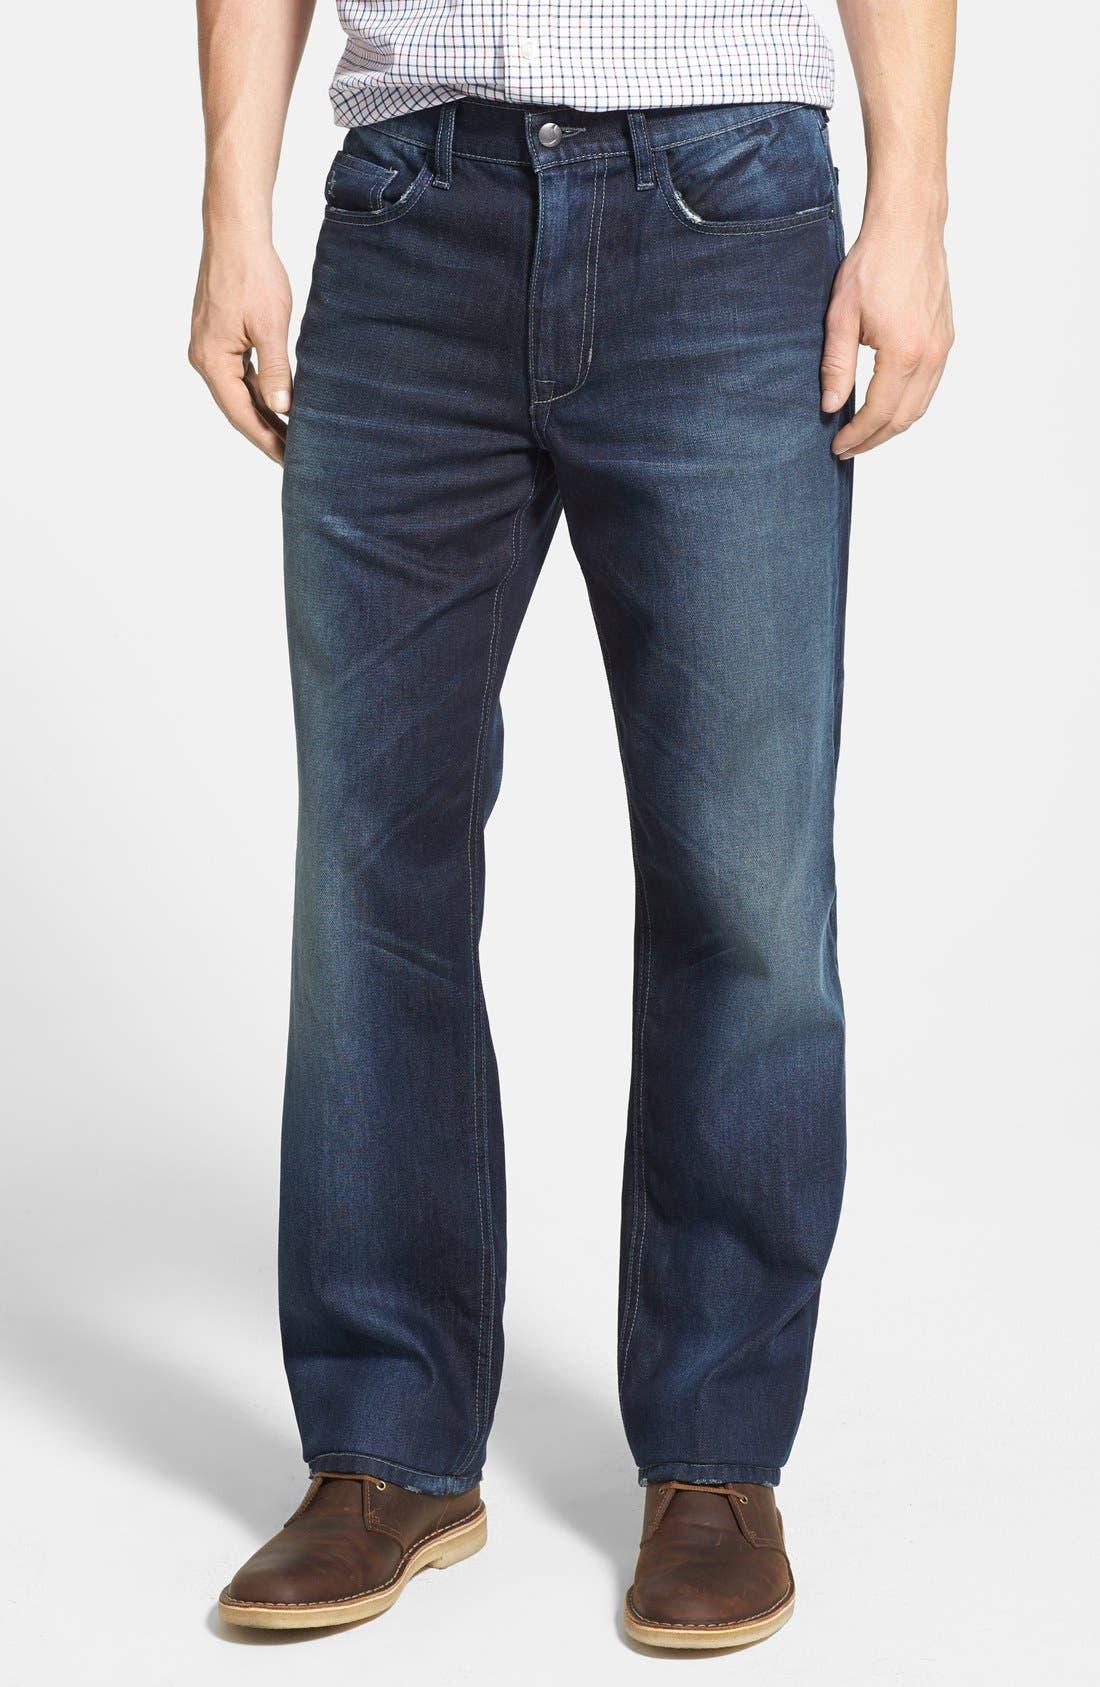 Main Image - Joe's 'Rebel' Relaxed Fit Jeans (Harrison)